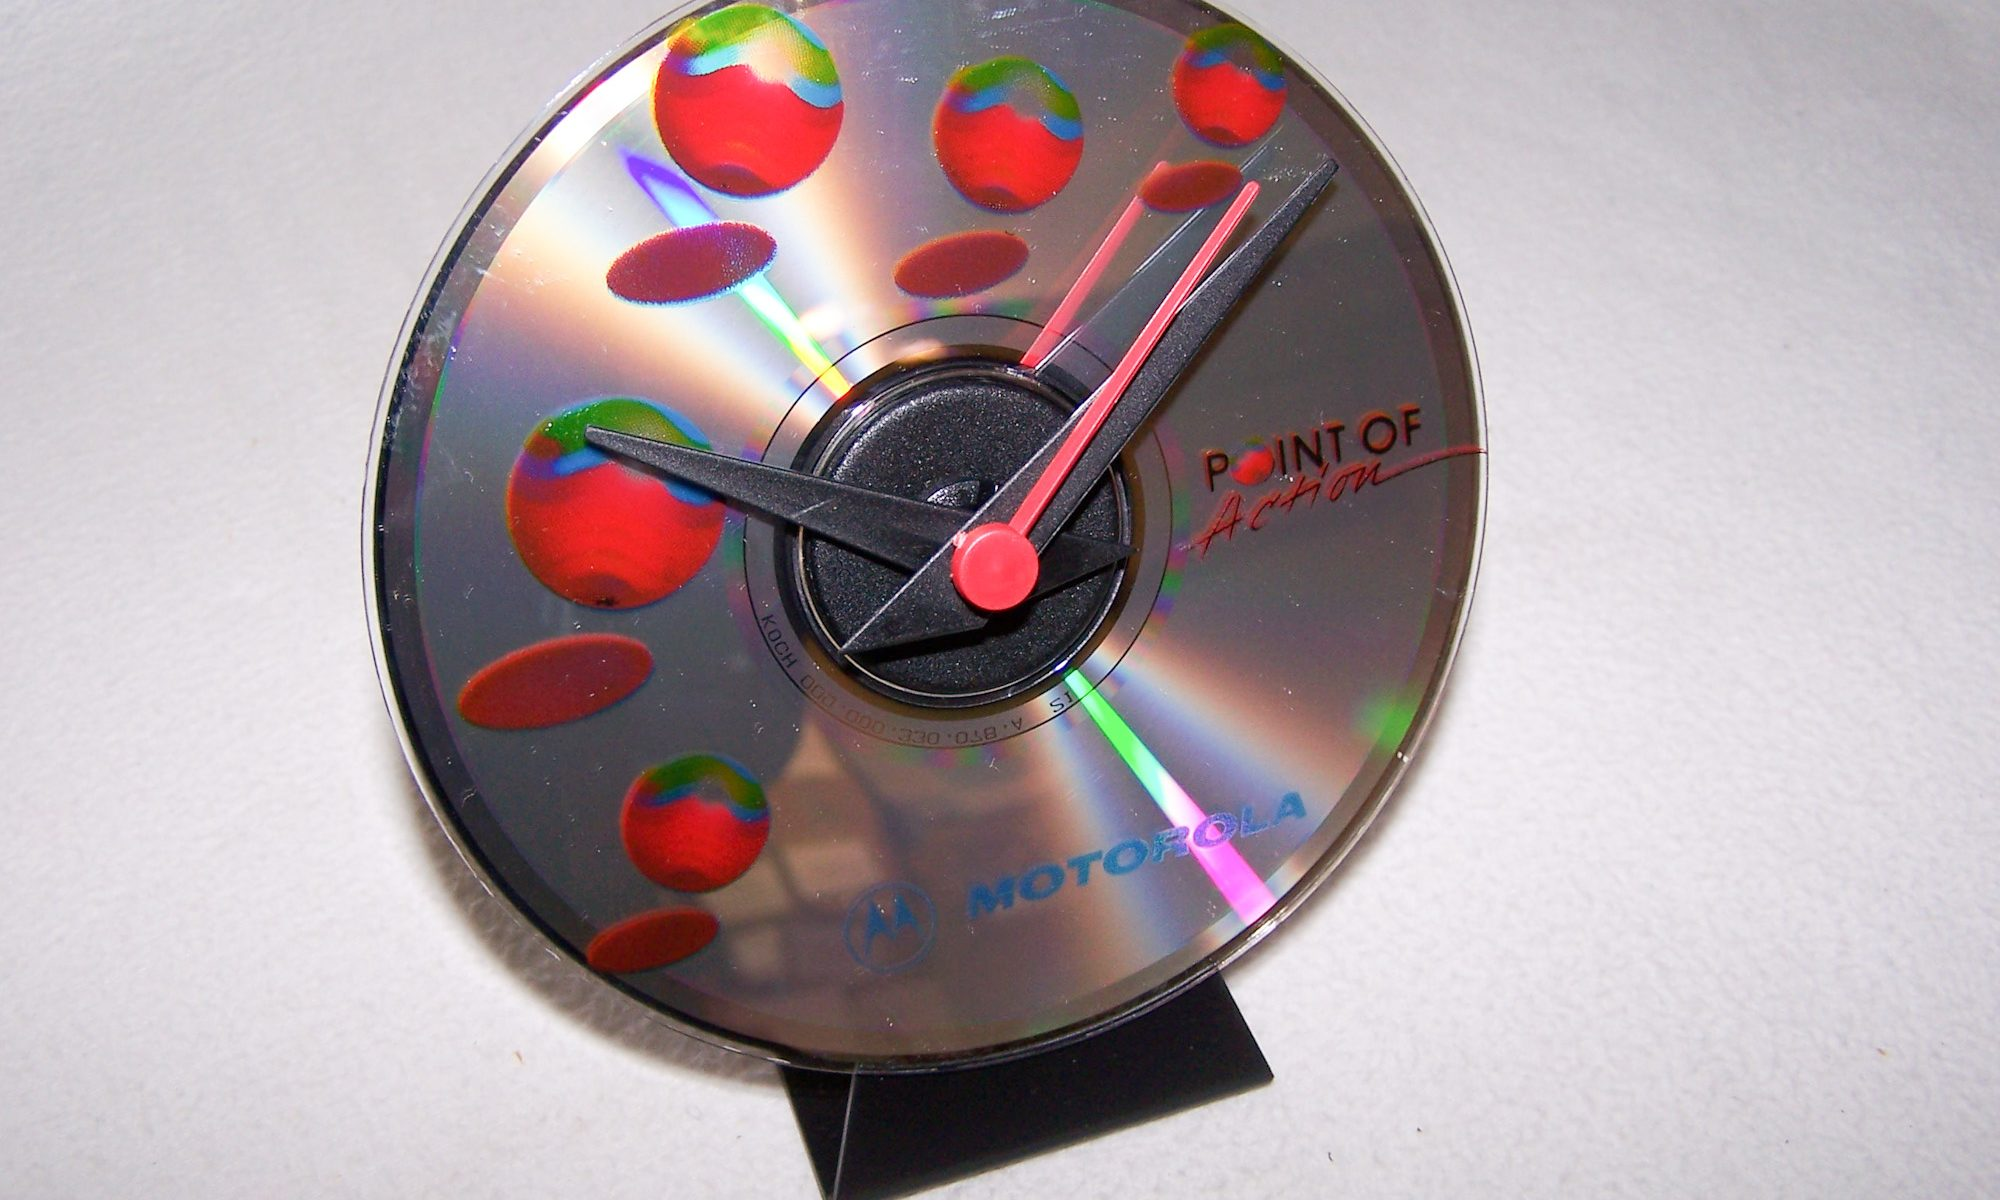 Haushalt - messen & regeln - CD-Tischuhr - links